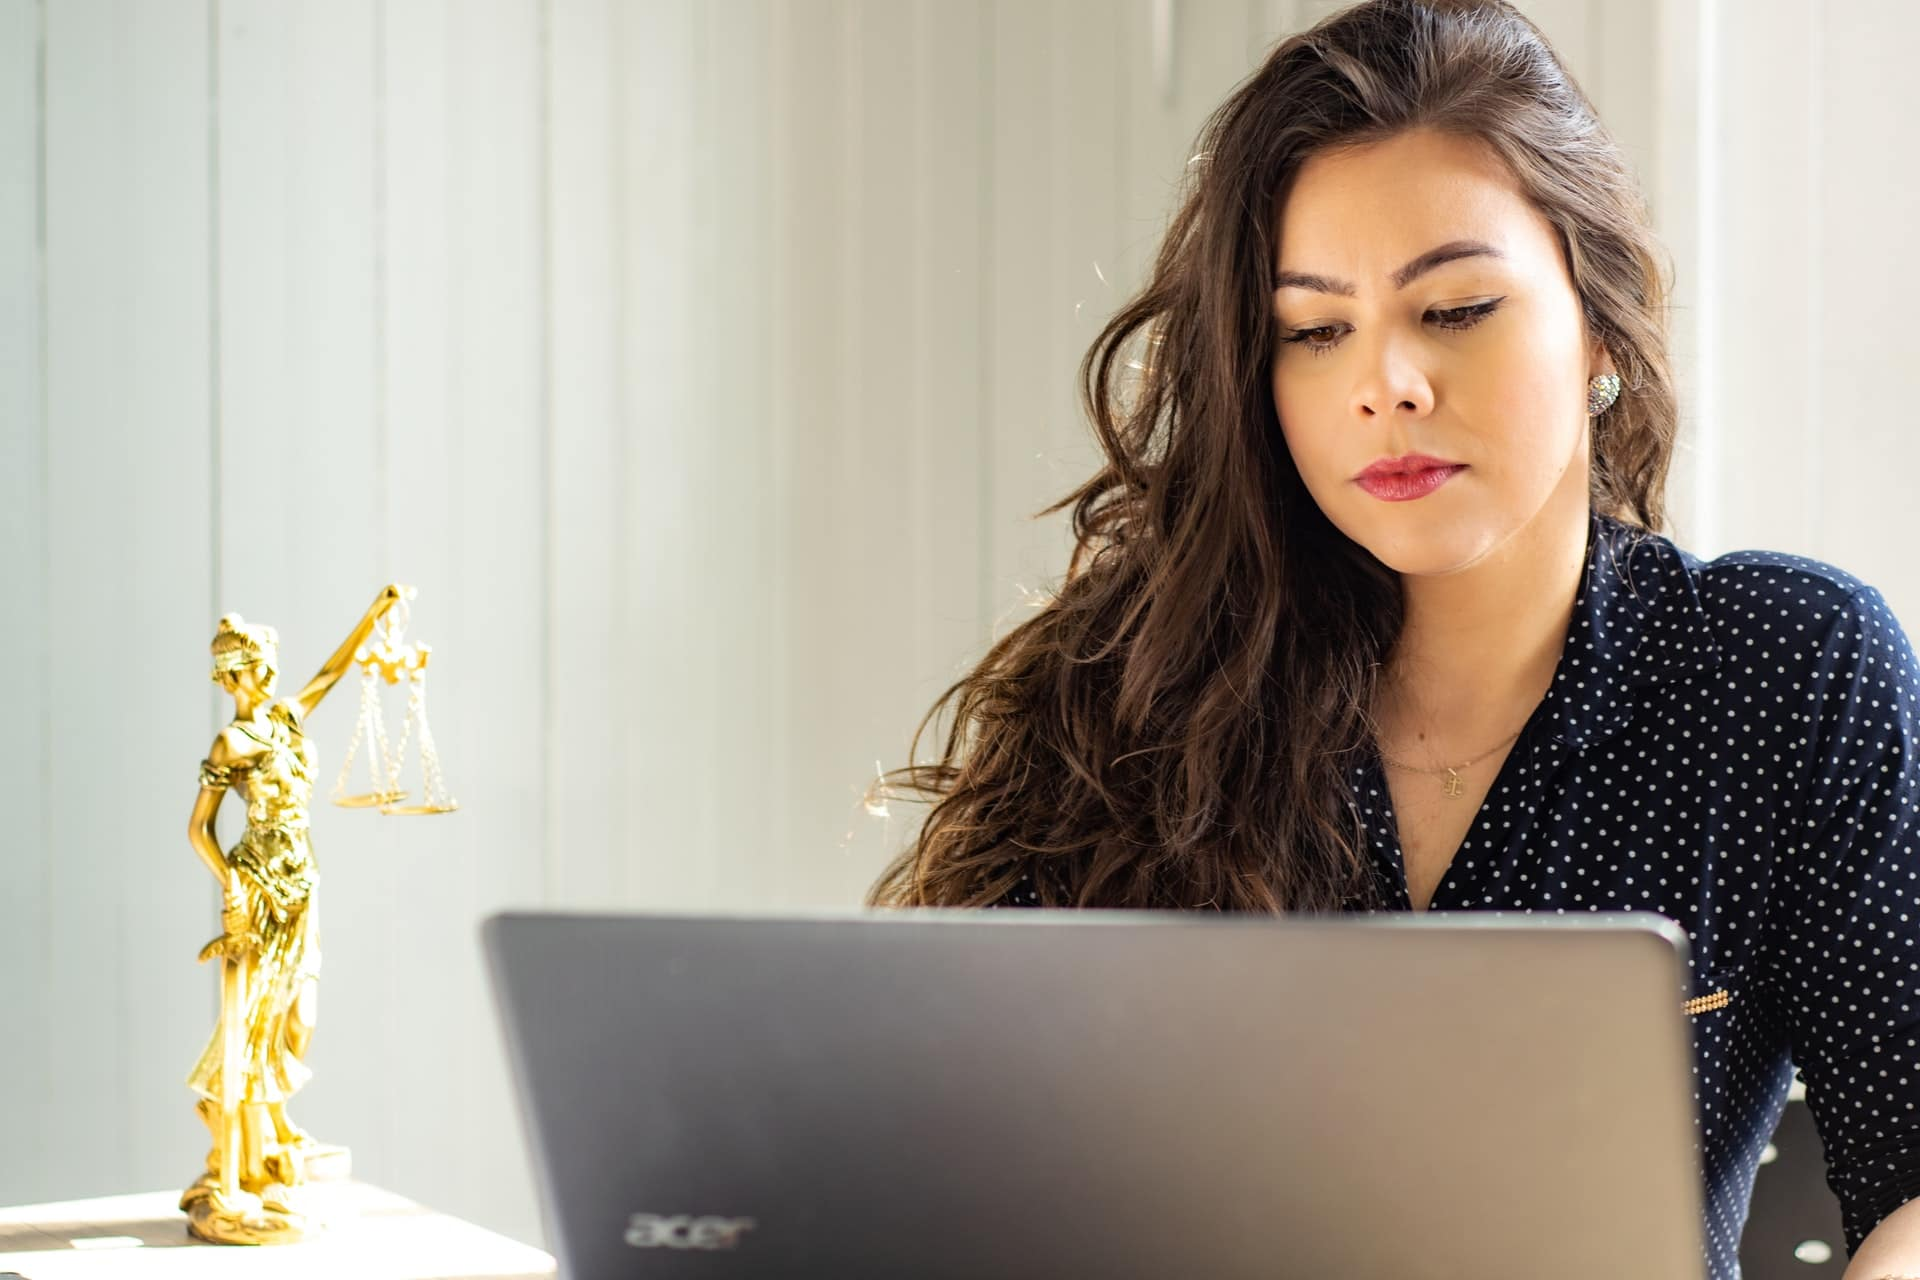 mateus campos felipe zd8px974bC8 unsplash - How to Find a Best Divorce Lawyer Near Me?